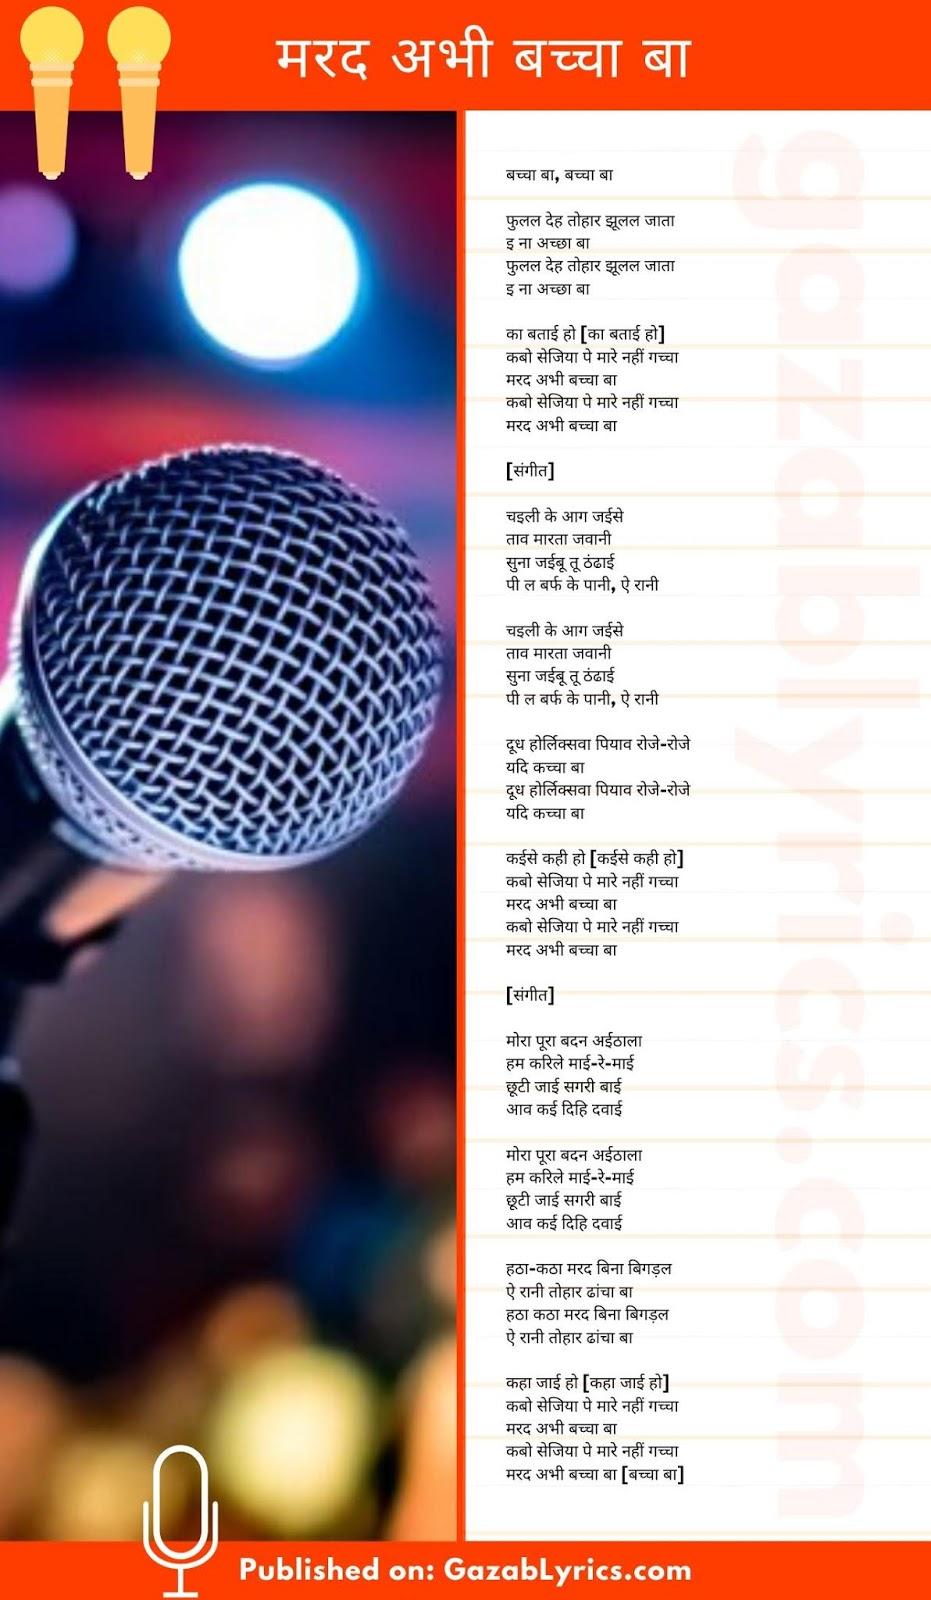 Marad Abhi Bacha Ba song lyrics image